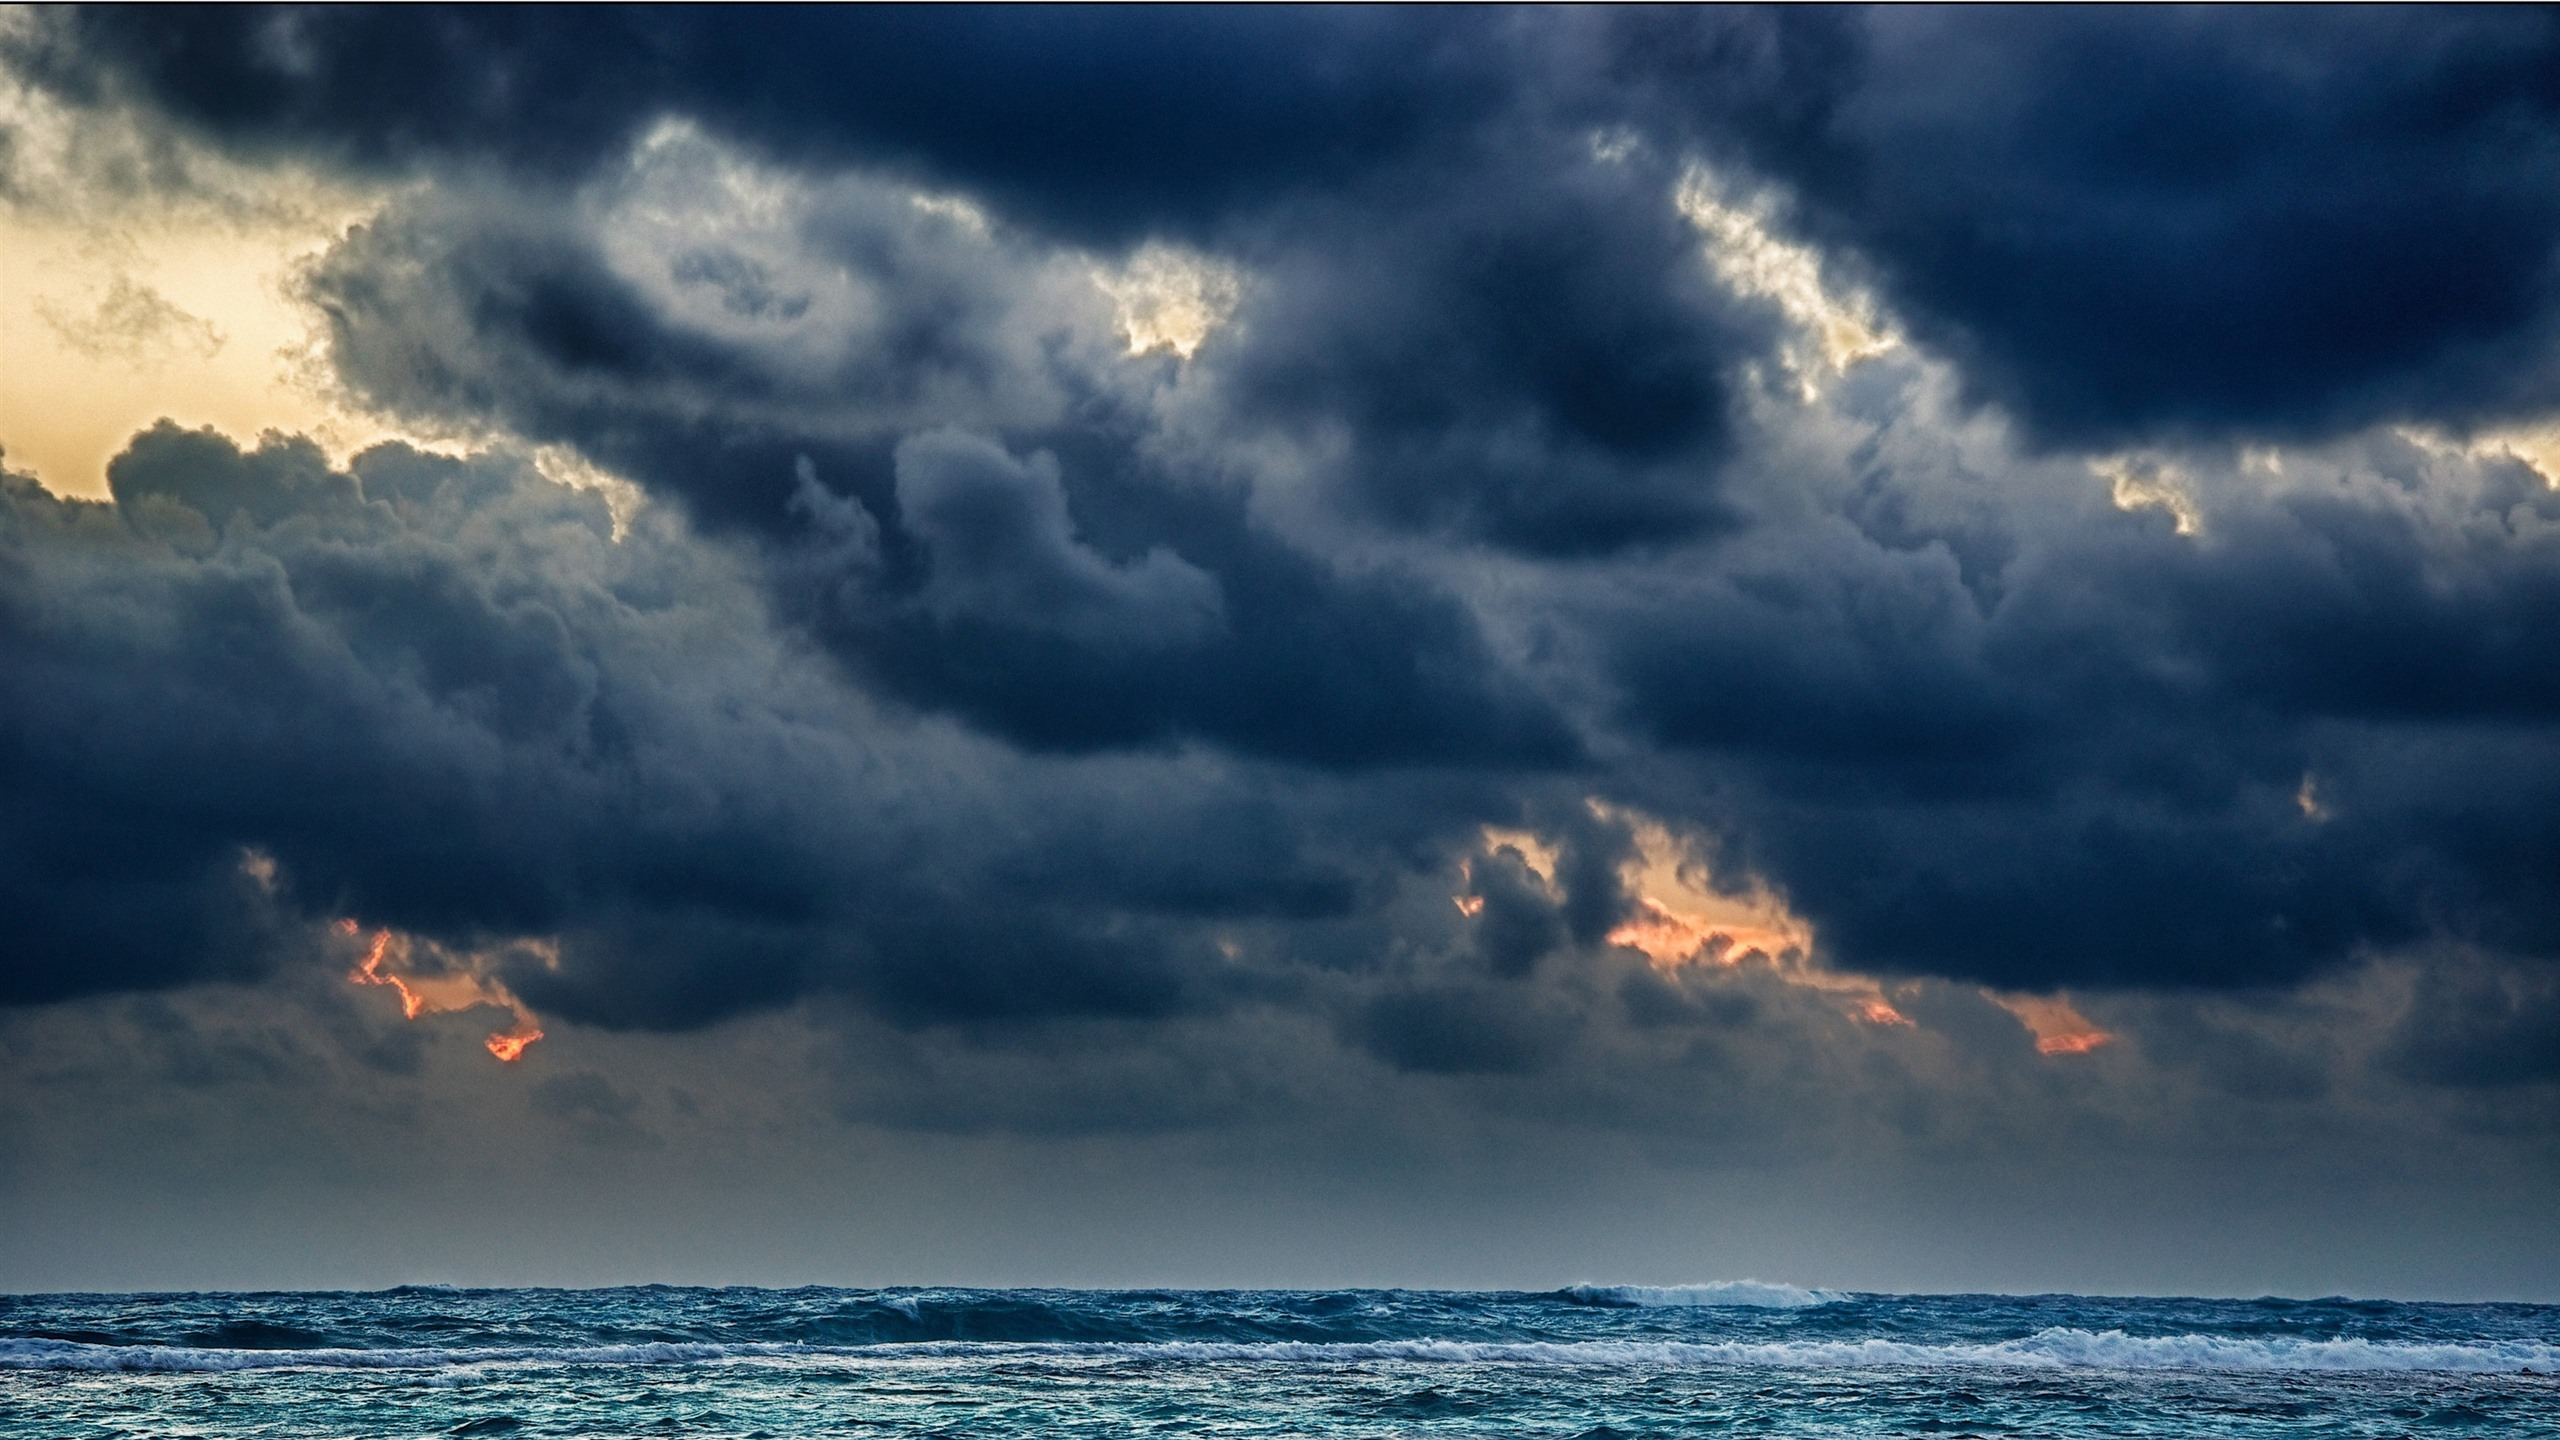 Wallpaper Black Clouds Sea Storm 2880x1800 Hd Picture Image